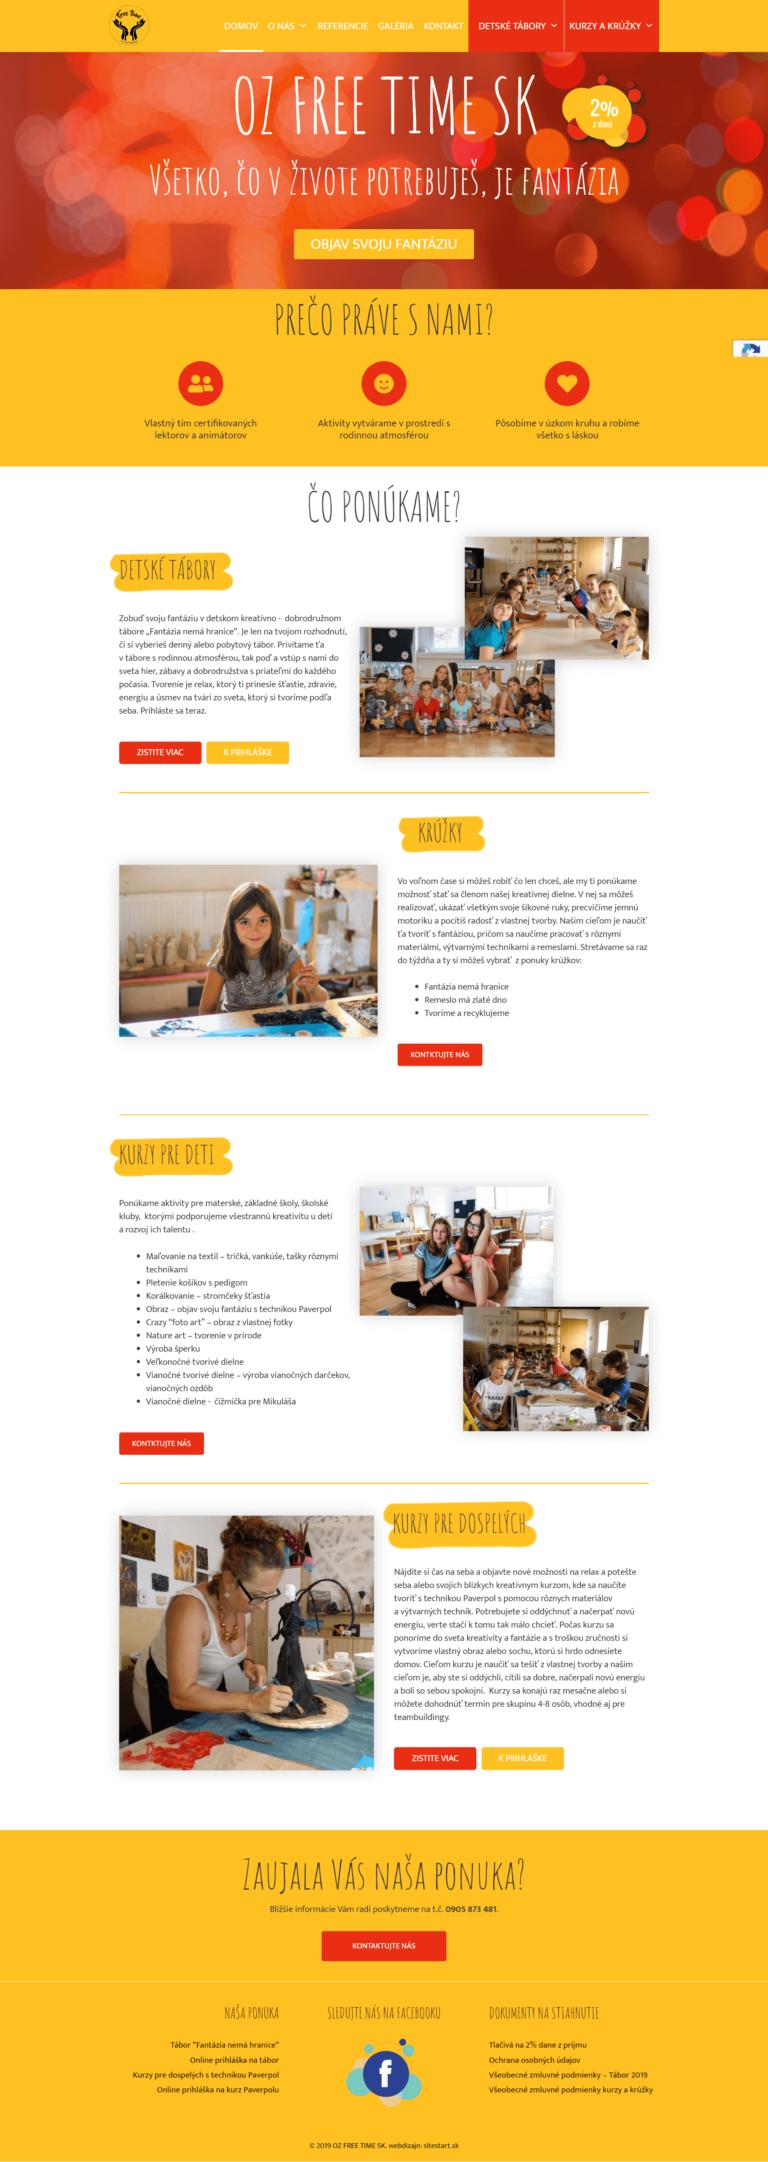 oz free time webdizajn domovská stránka